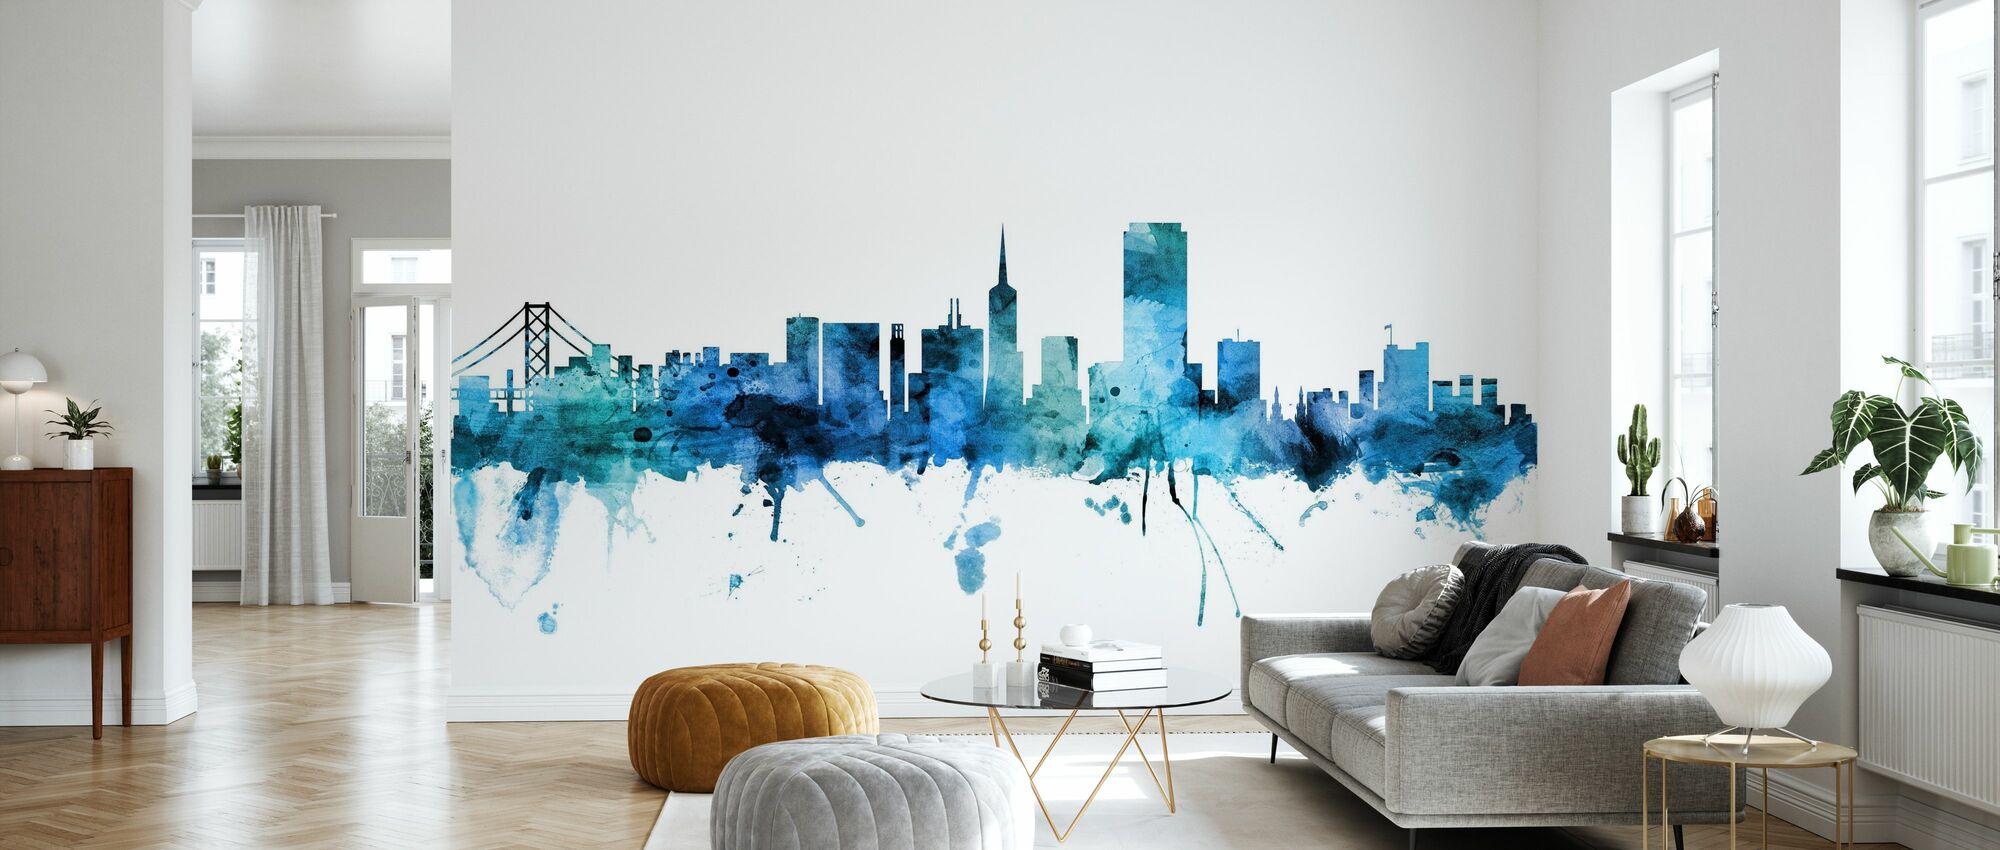 San Francisco California Skyline - Wallpaper - Living Room